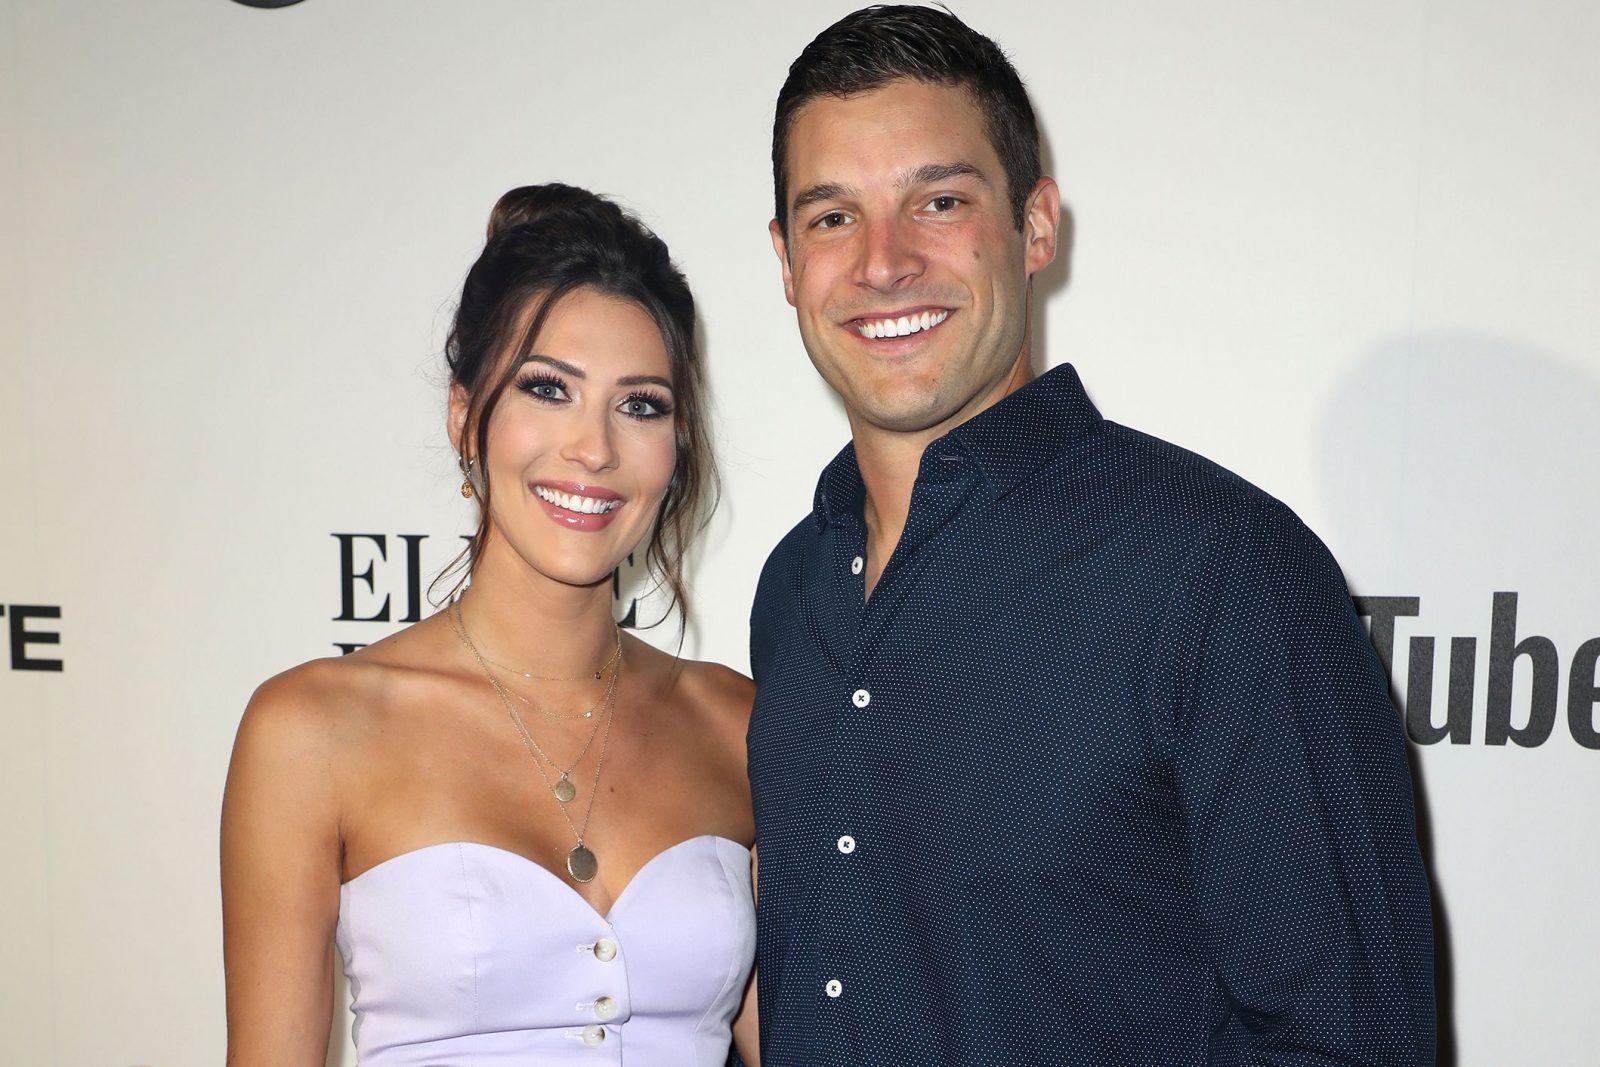 Are Becca And Garrett Still Together?